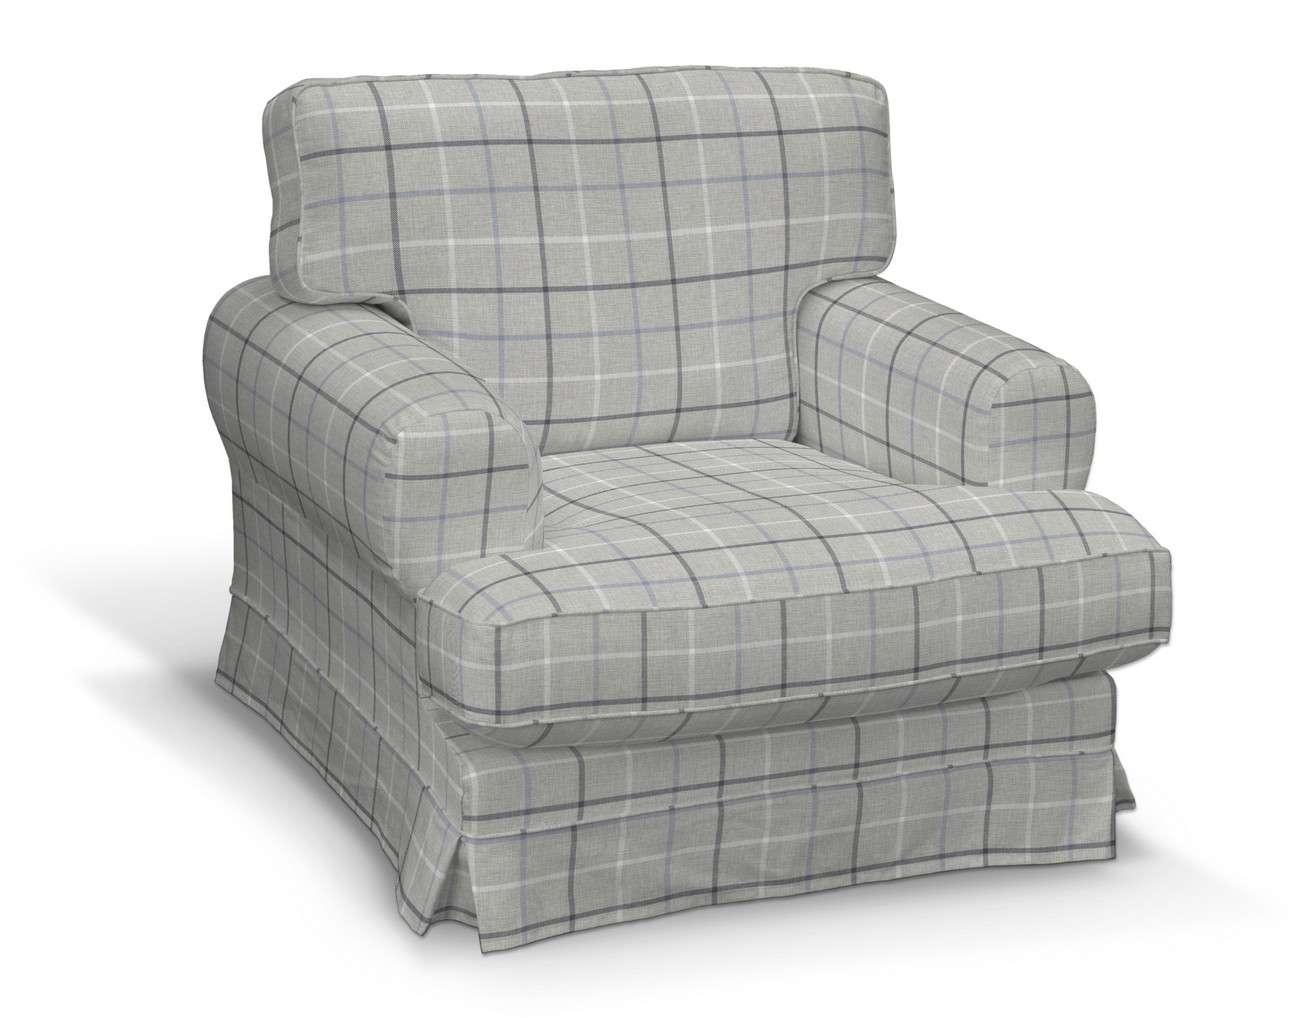 Ekeskog  fotelhuzat a kollekcióból Edinburgh Bútorszövet, Dekoranyag: 703-18